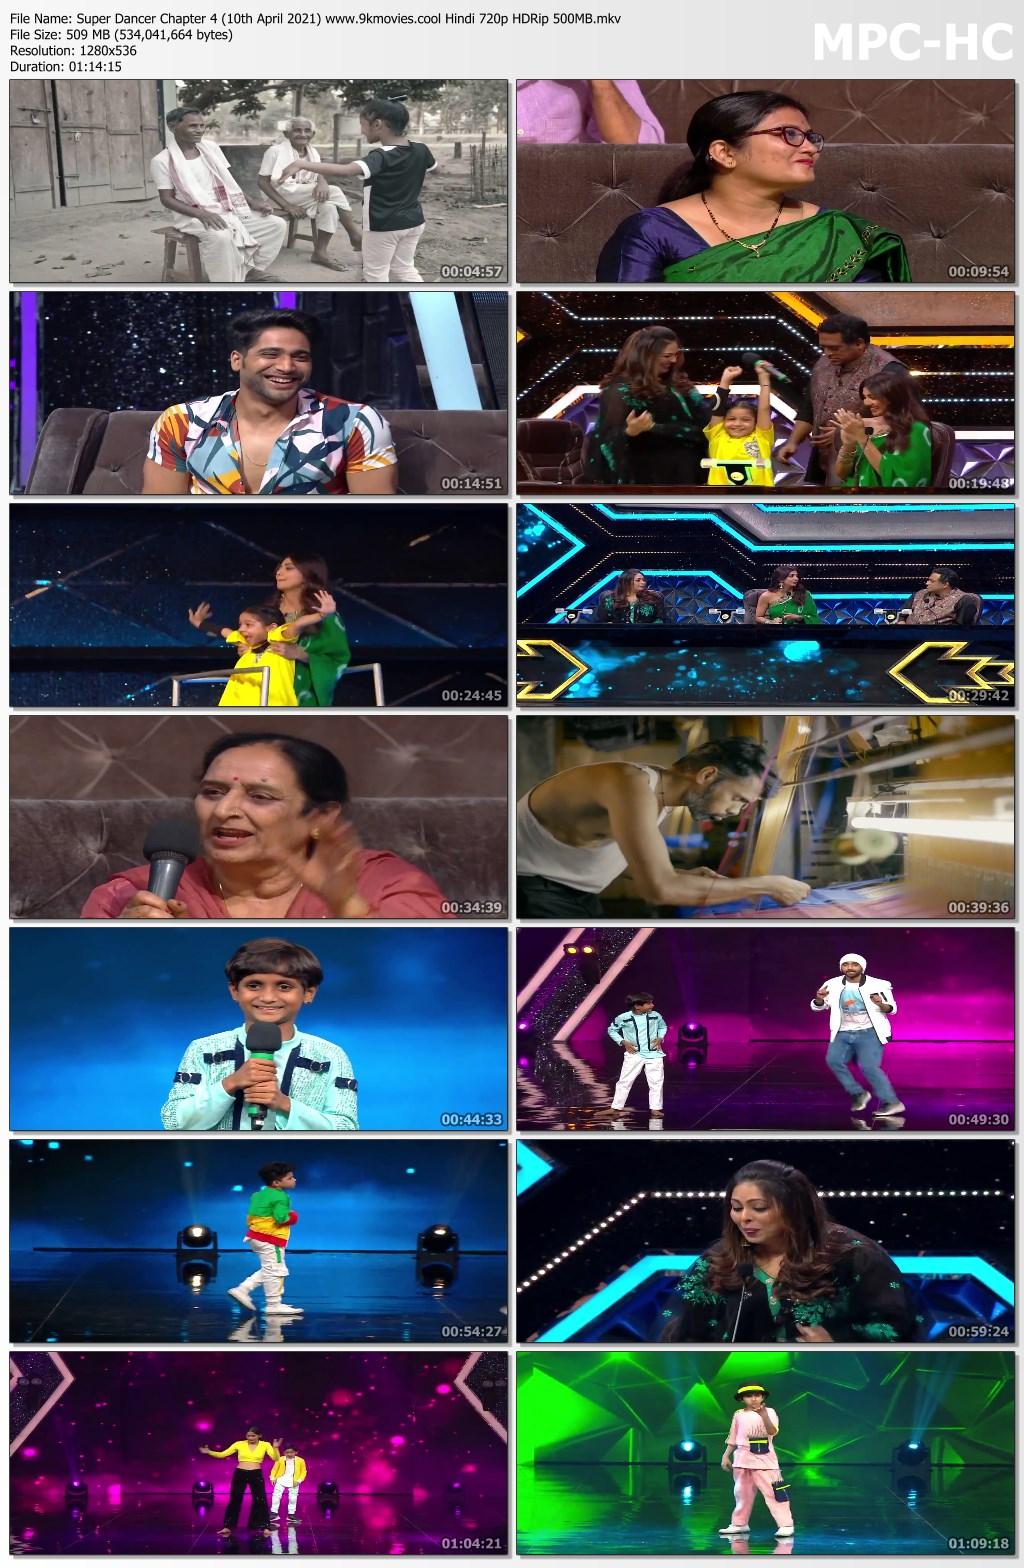 Download Super Dancer Chapter 4 (10th April 2021) Hindi 720p HDRip 500MB